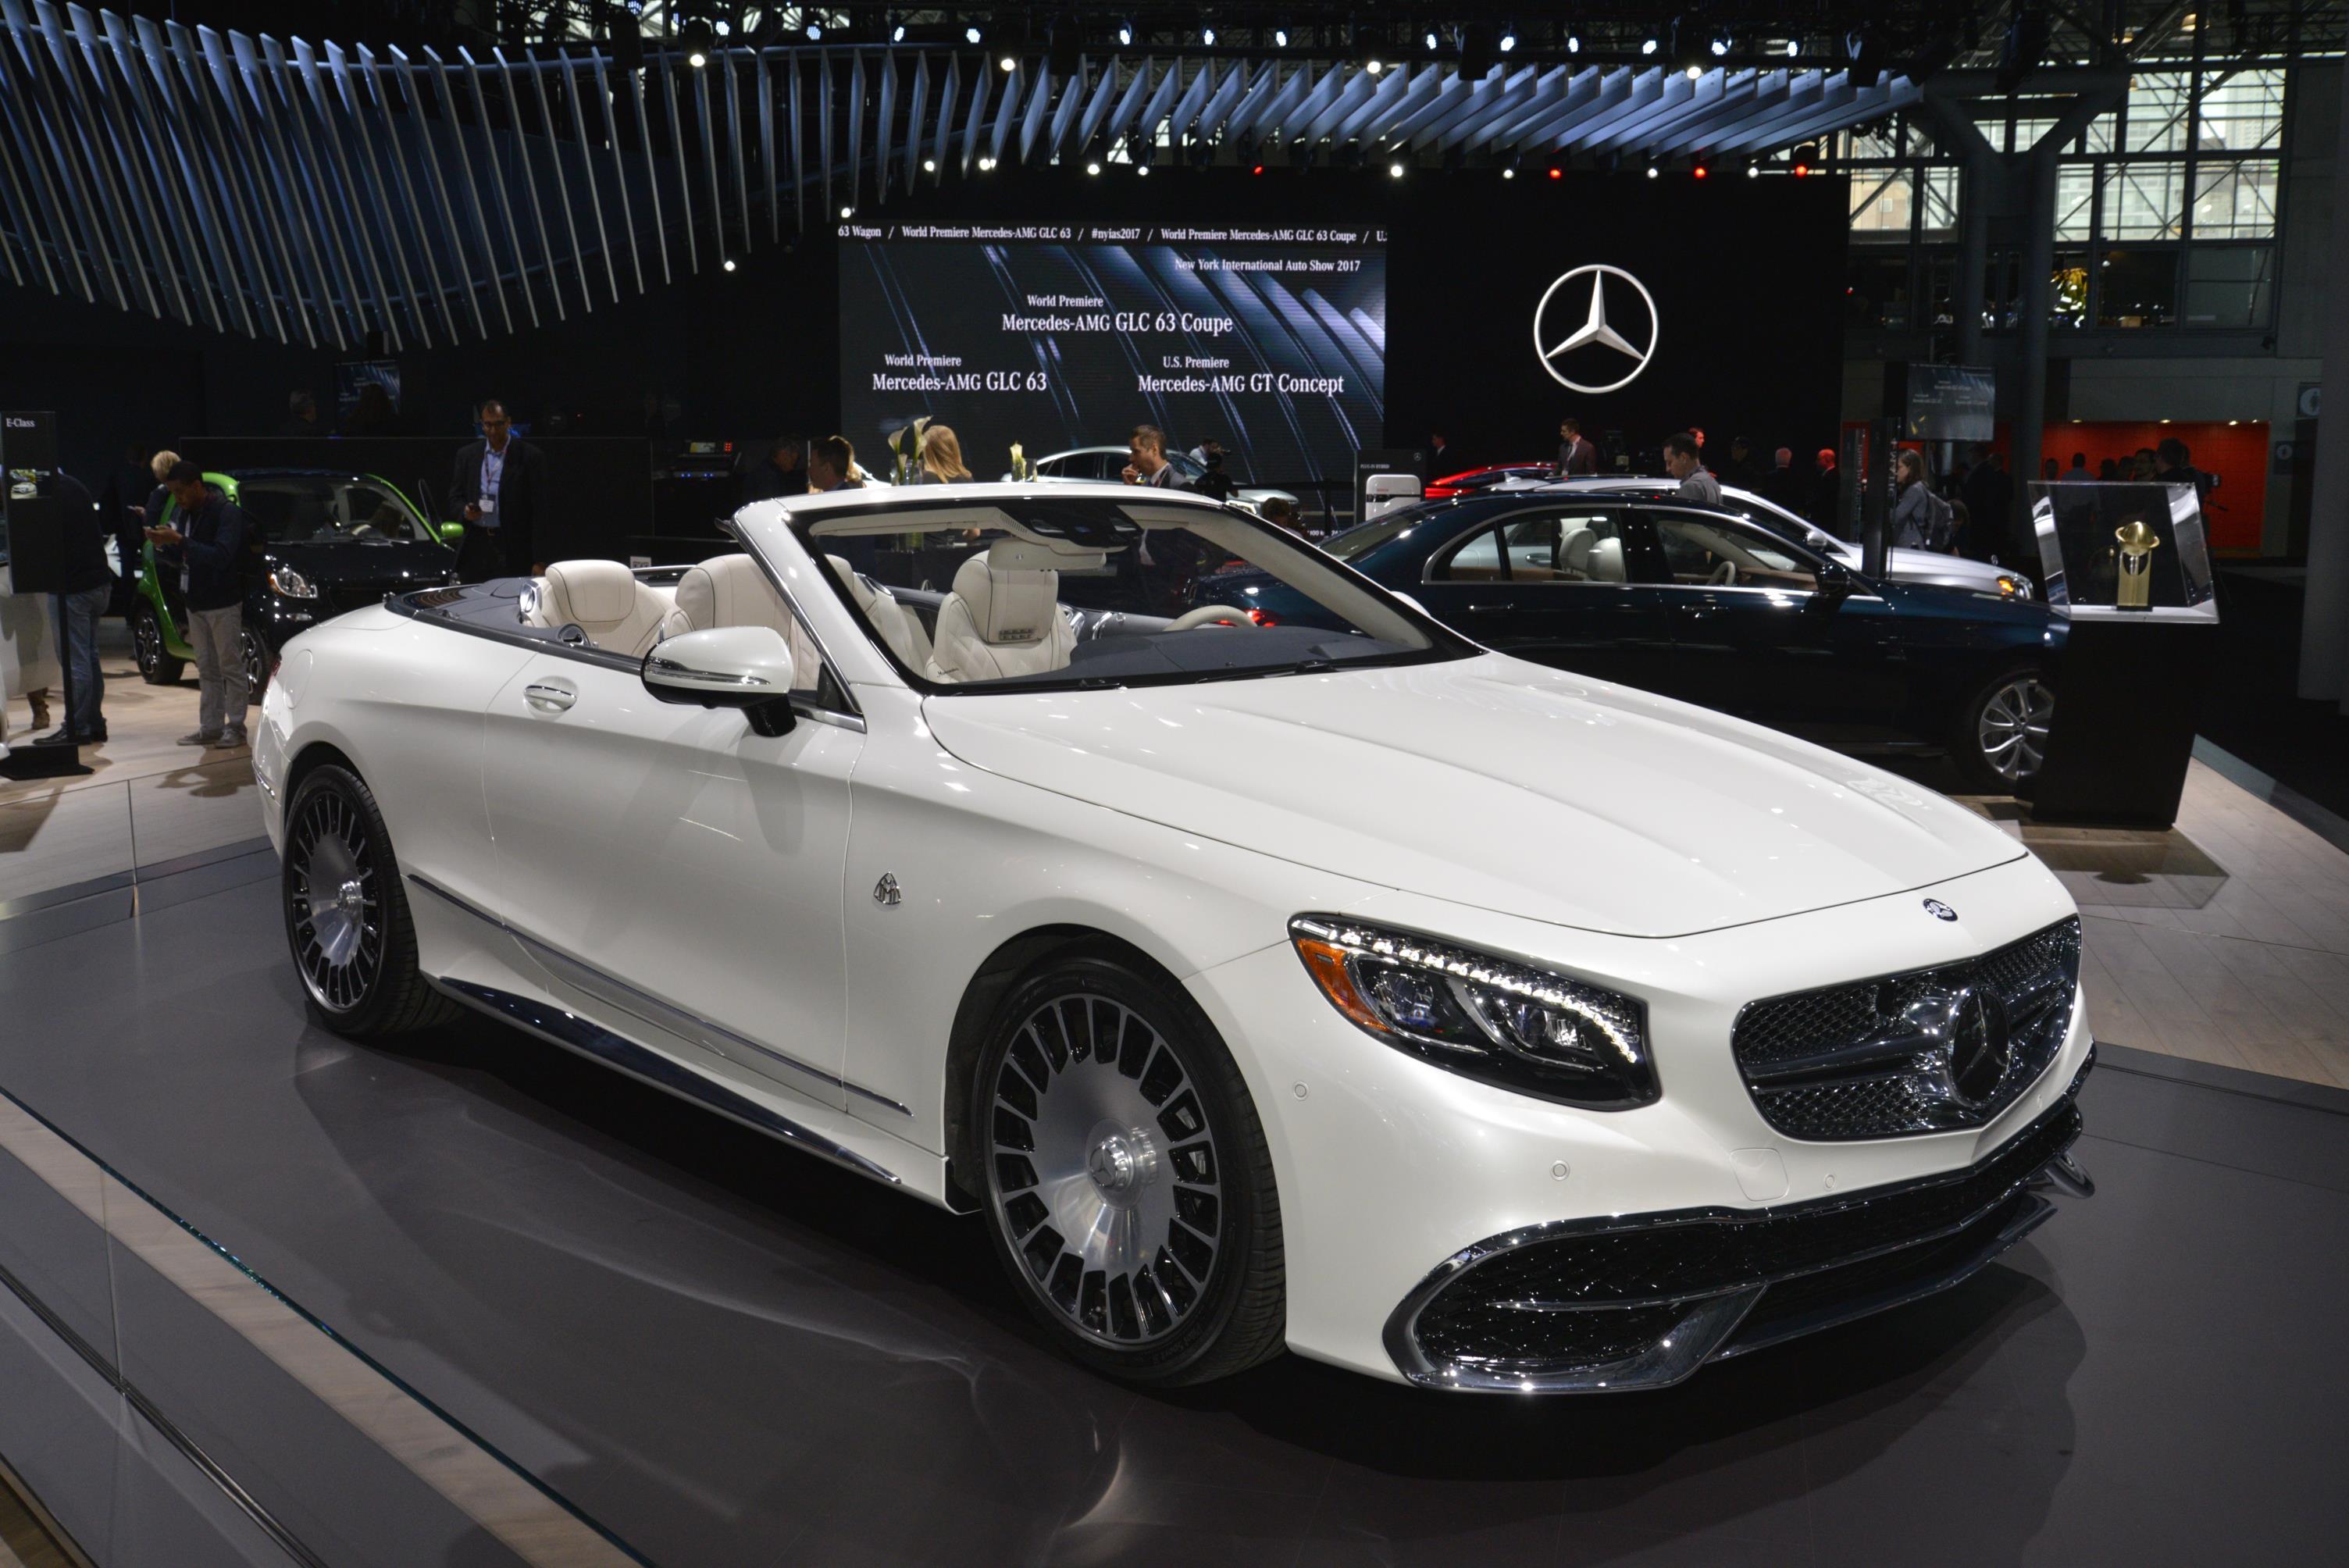 New York Auto Show 2017 (225)